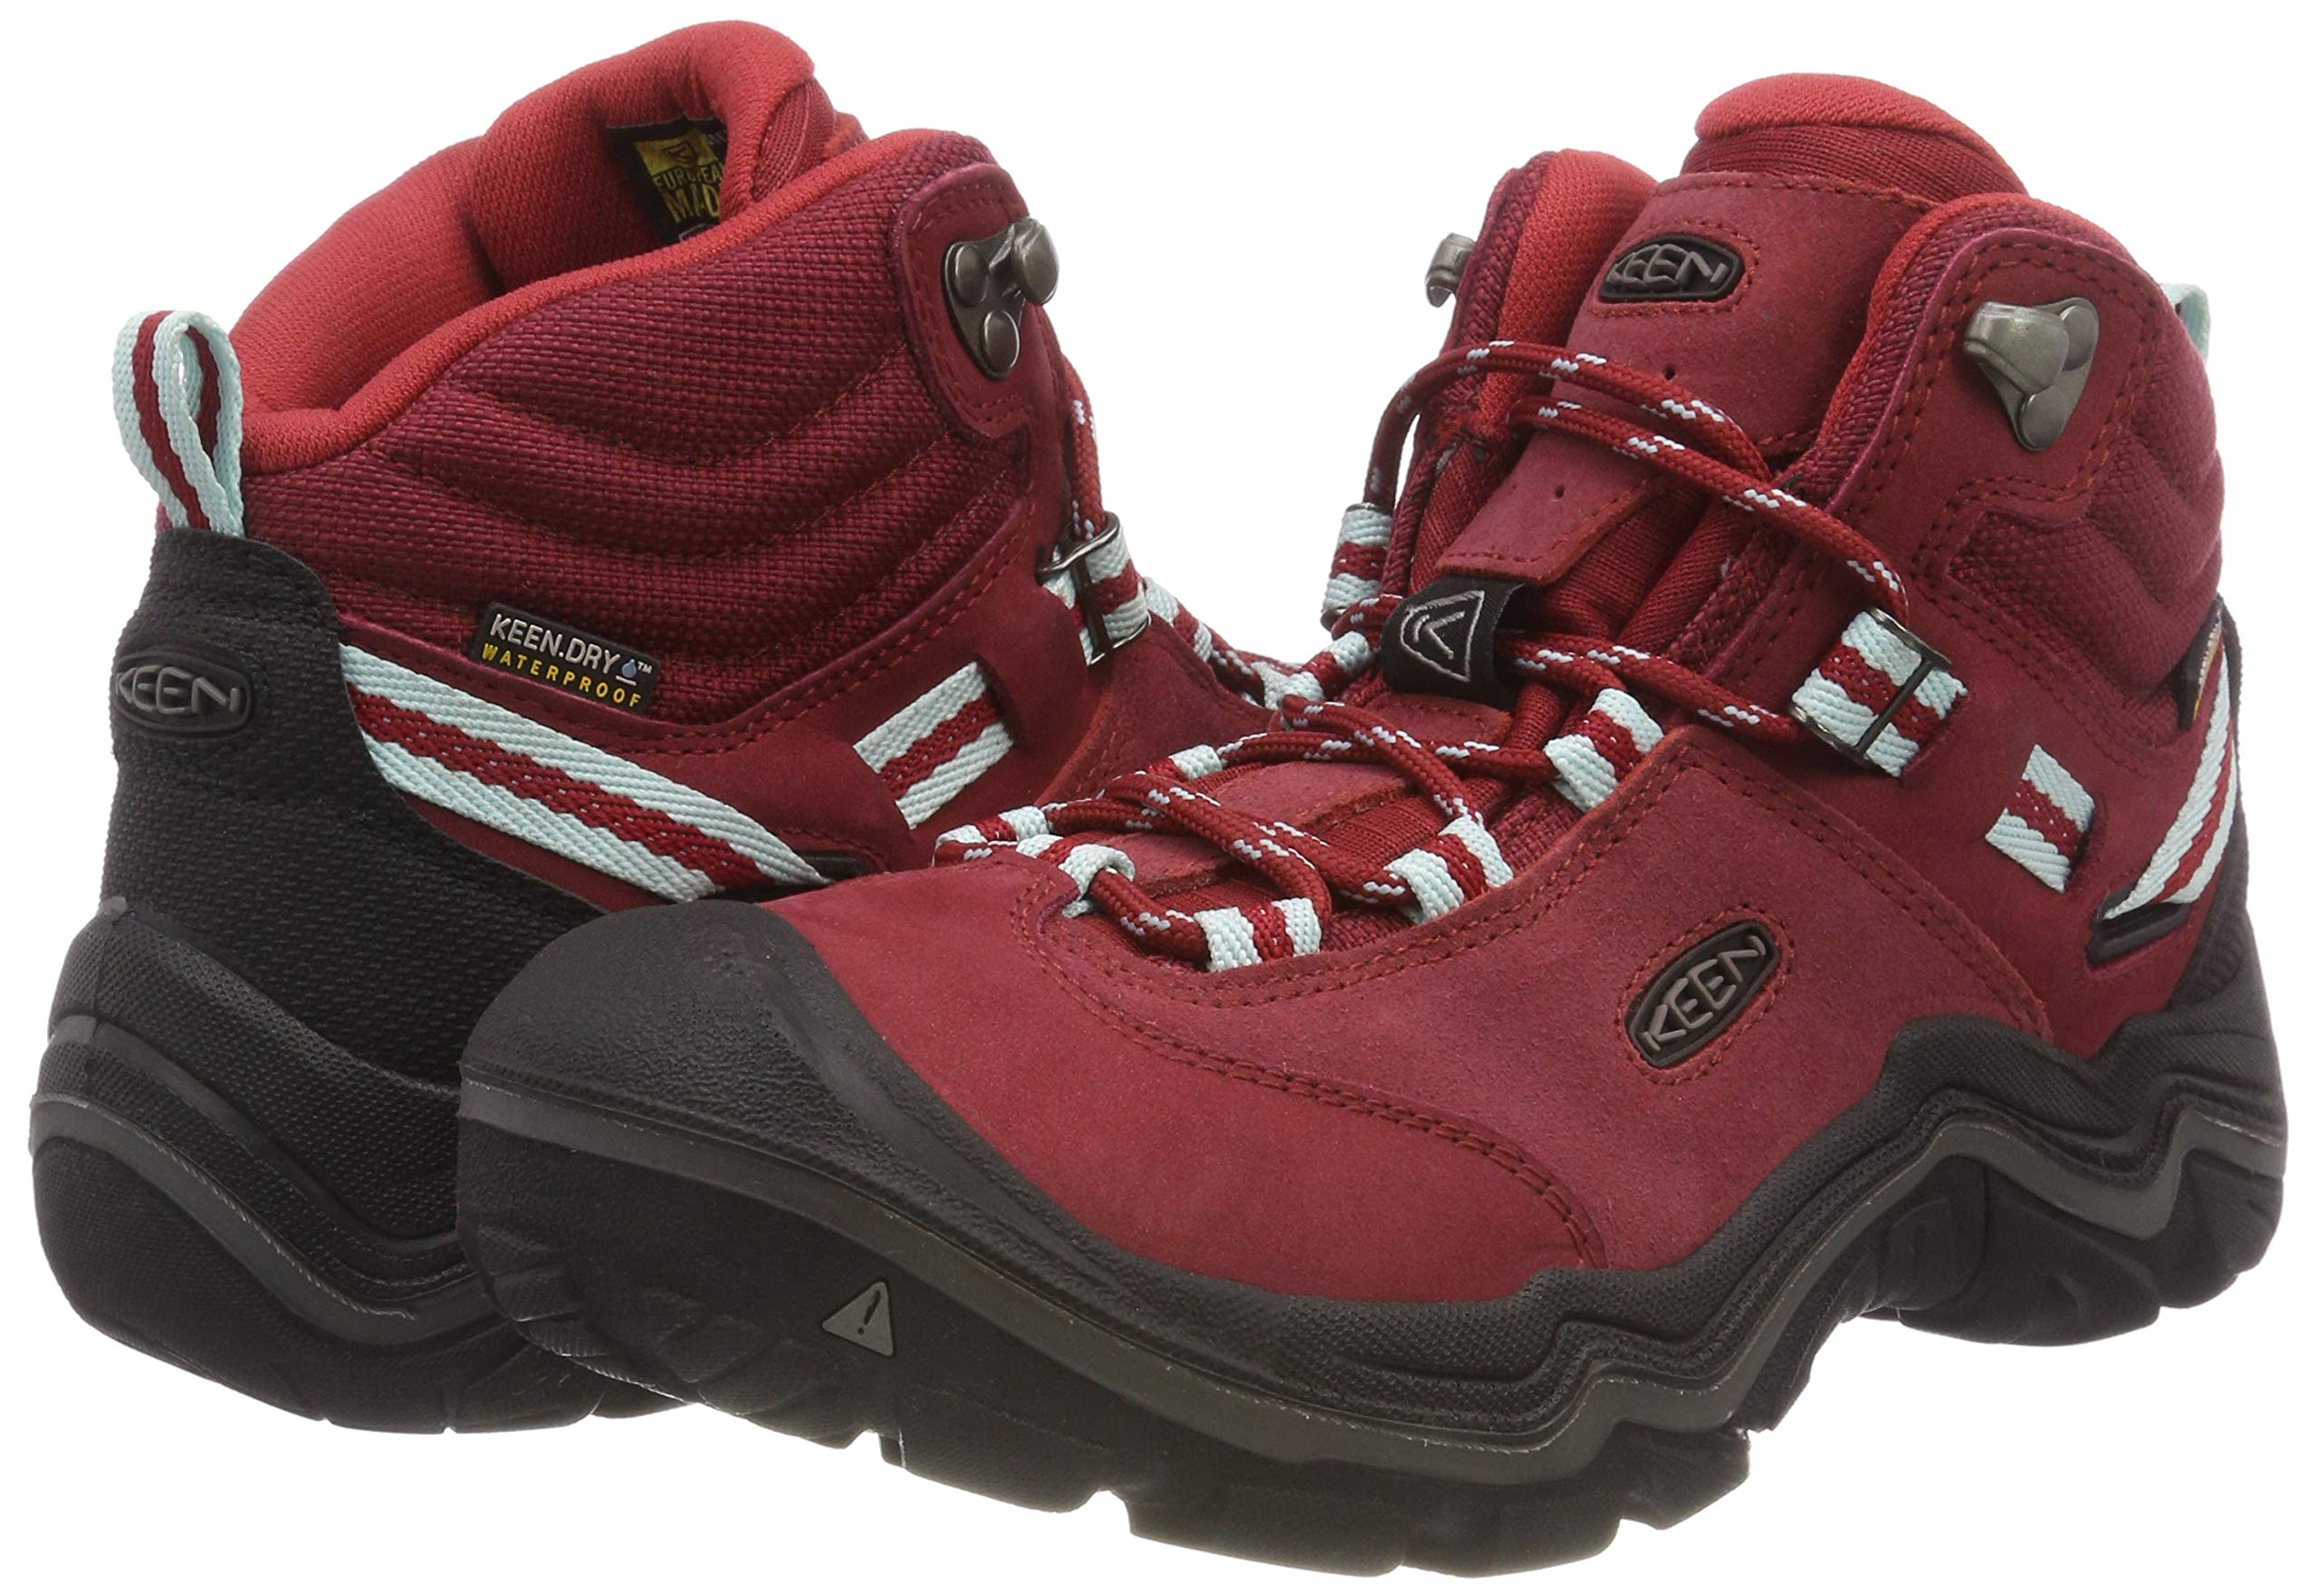 KEEN Women's Wanderer Waterproof Mid High Rise Hiking Shoes, 8.5 UK 5